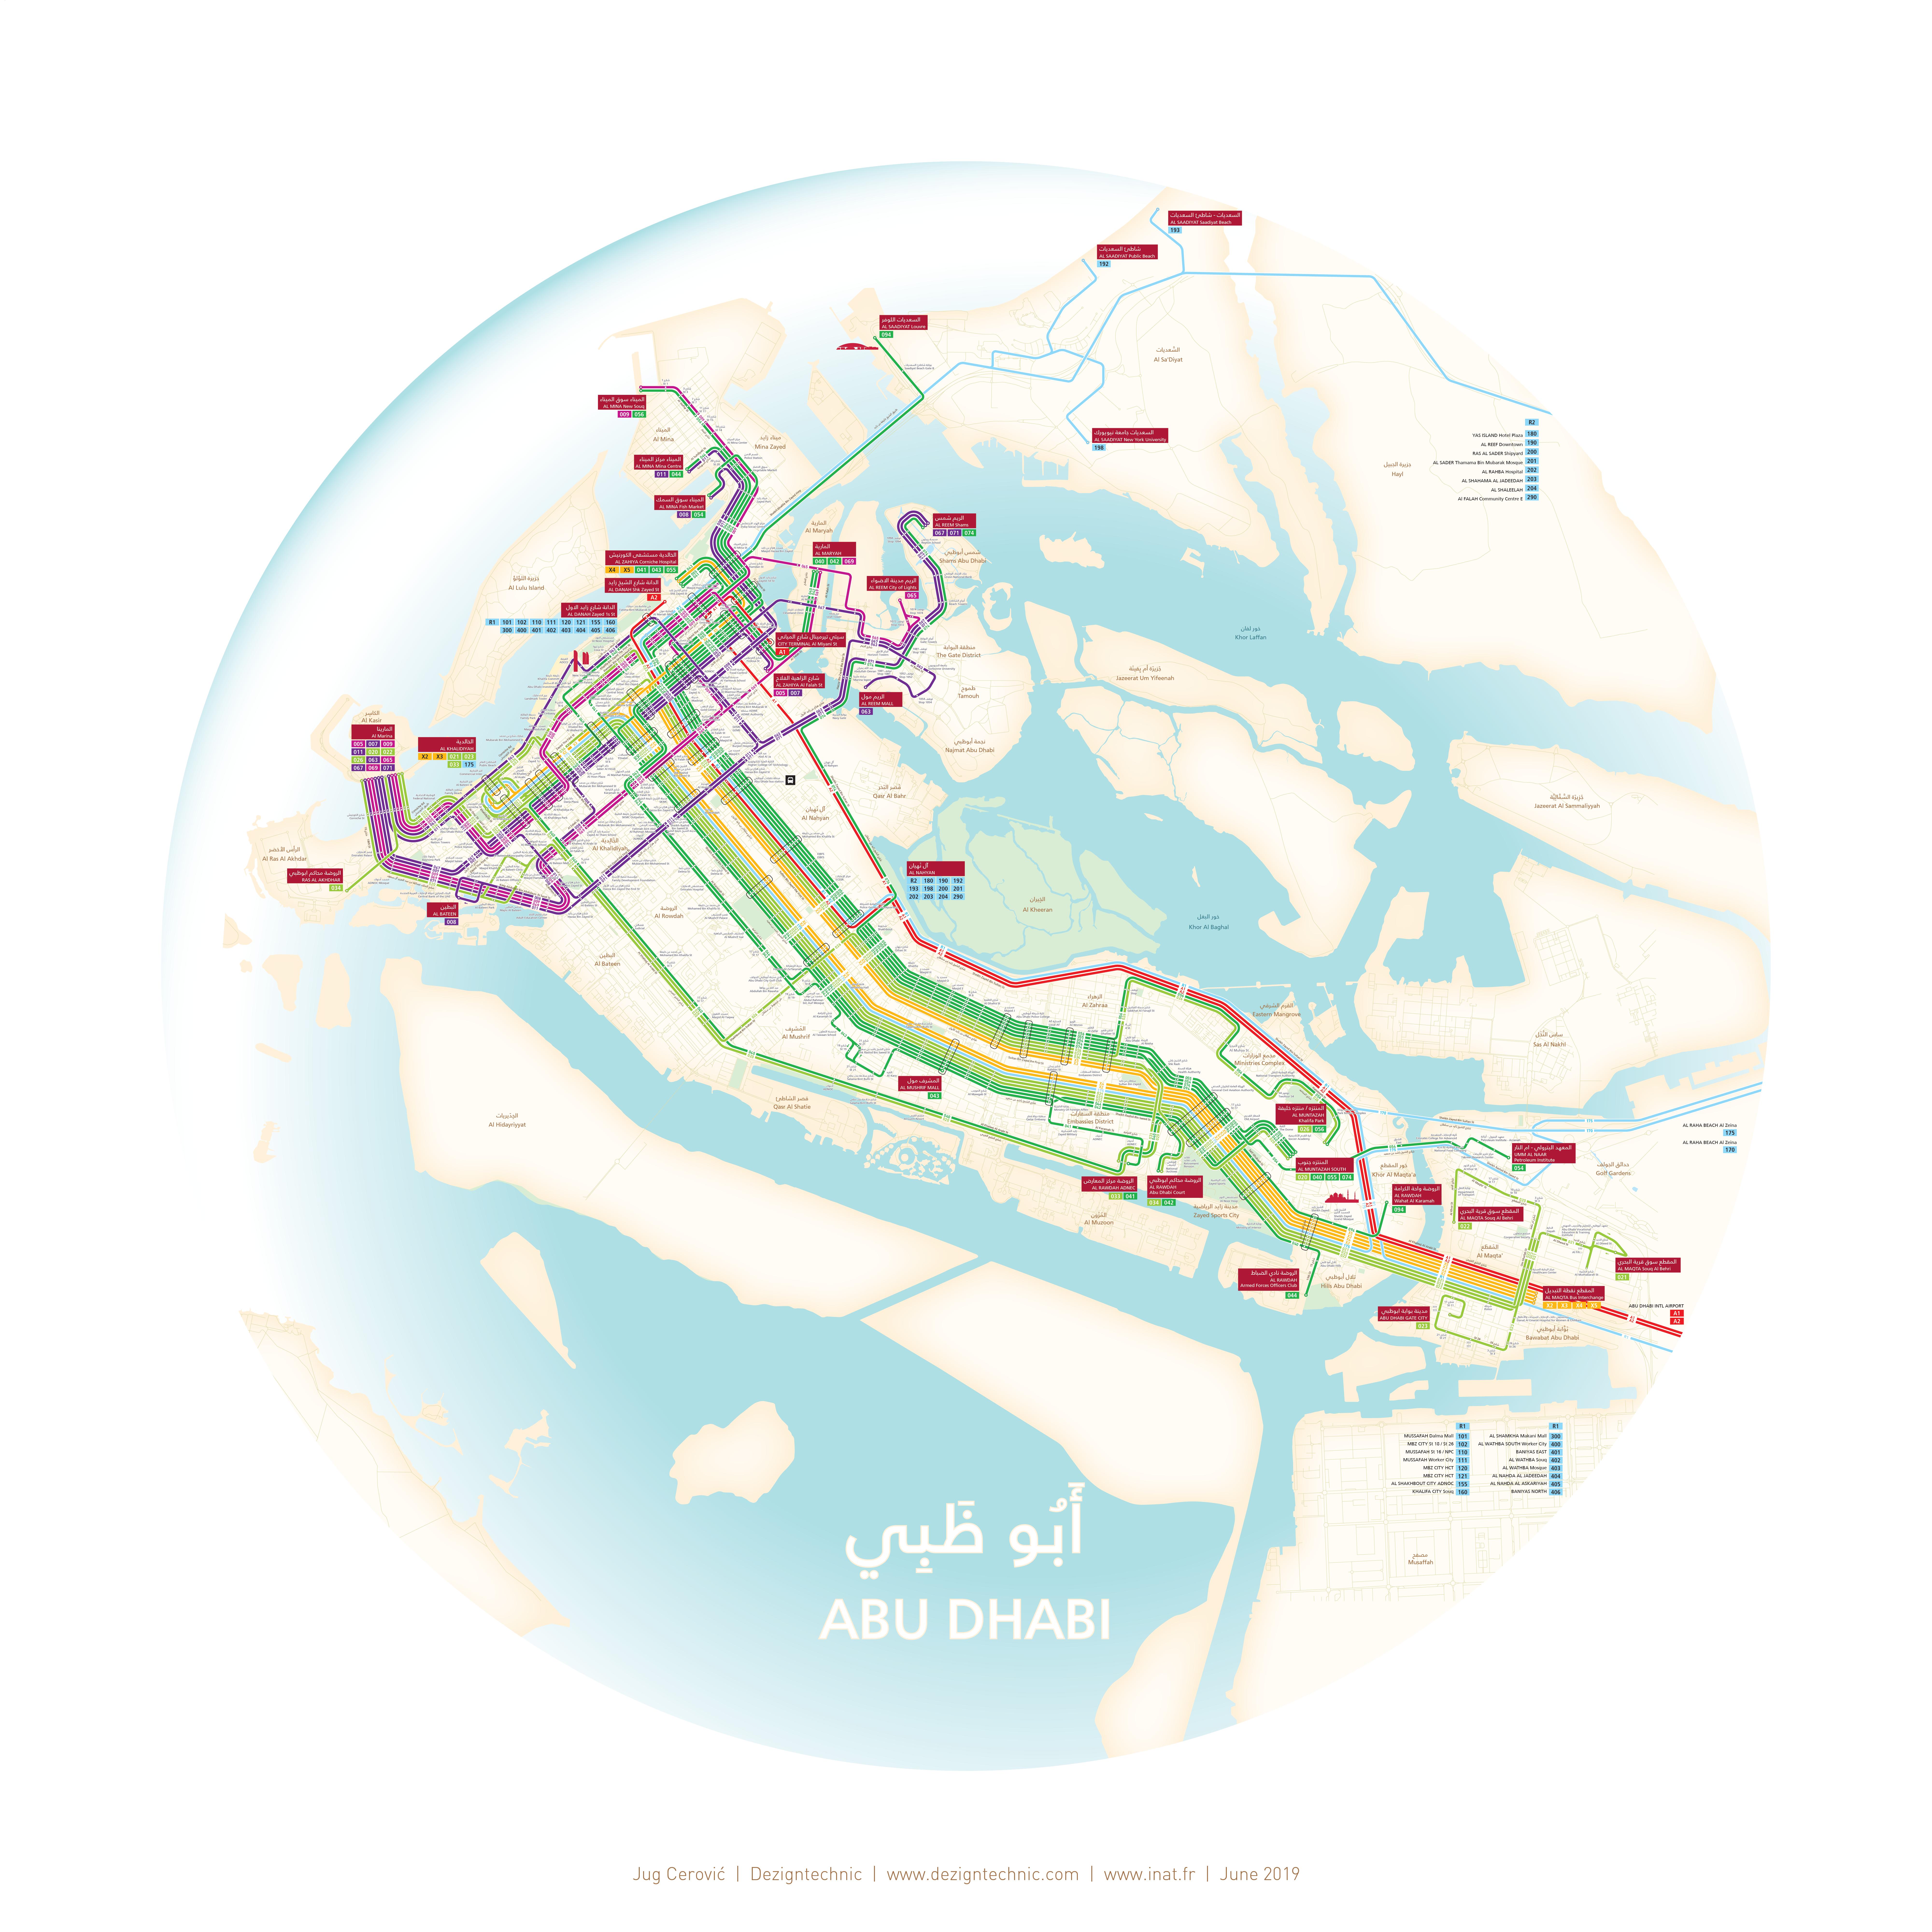 Abu Dhabi Bus Map : inat on dubai international airport, map of bissau, map of dubai, map of ndola, map of saudi arabia, sheikh zayed mosque, etihad airways, ferrari world abu dhabi, burj khalifa, map of doha, emirates palace, map of haydarpasa, map of china, ras al-khaimah, map of muscat, khalifa bin zayed al nahyan, united arab emirates, map of africa, map of india, map of kharian, map of baghdad, map of hong kong, map of sulaymaniyah, map of tel aviv, map of sohar, al ain, map of hadramaut, map of irbil, map of united arab emirates, map of uae, persian gulf,